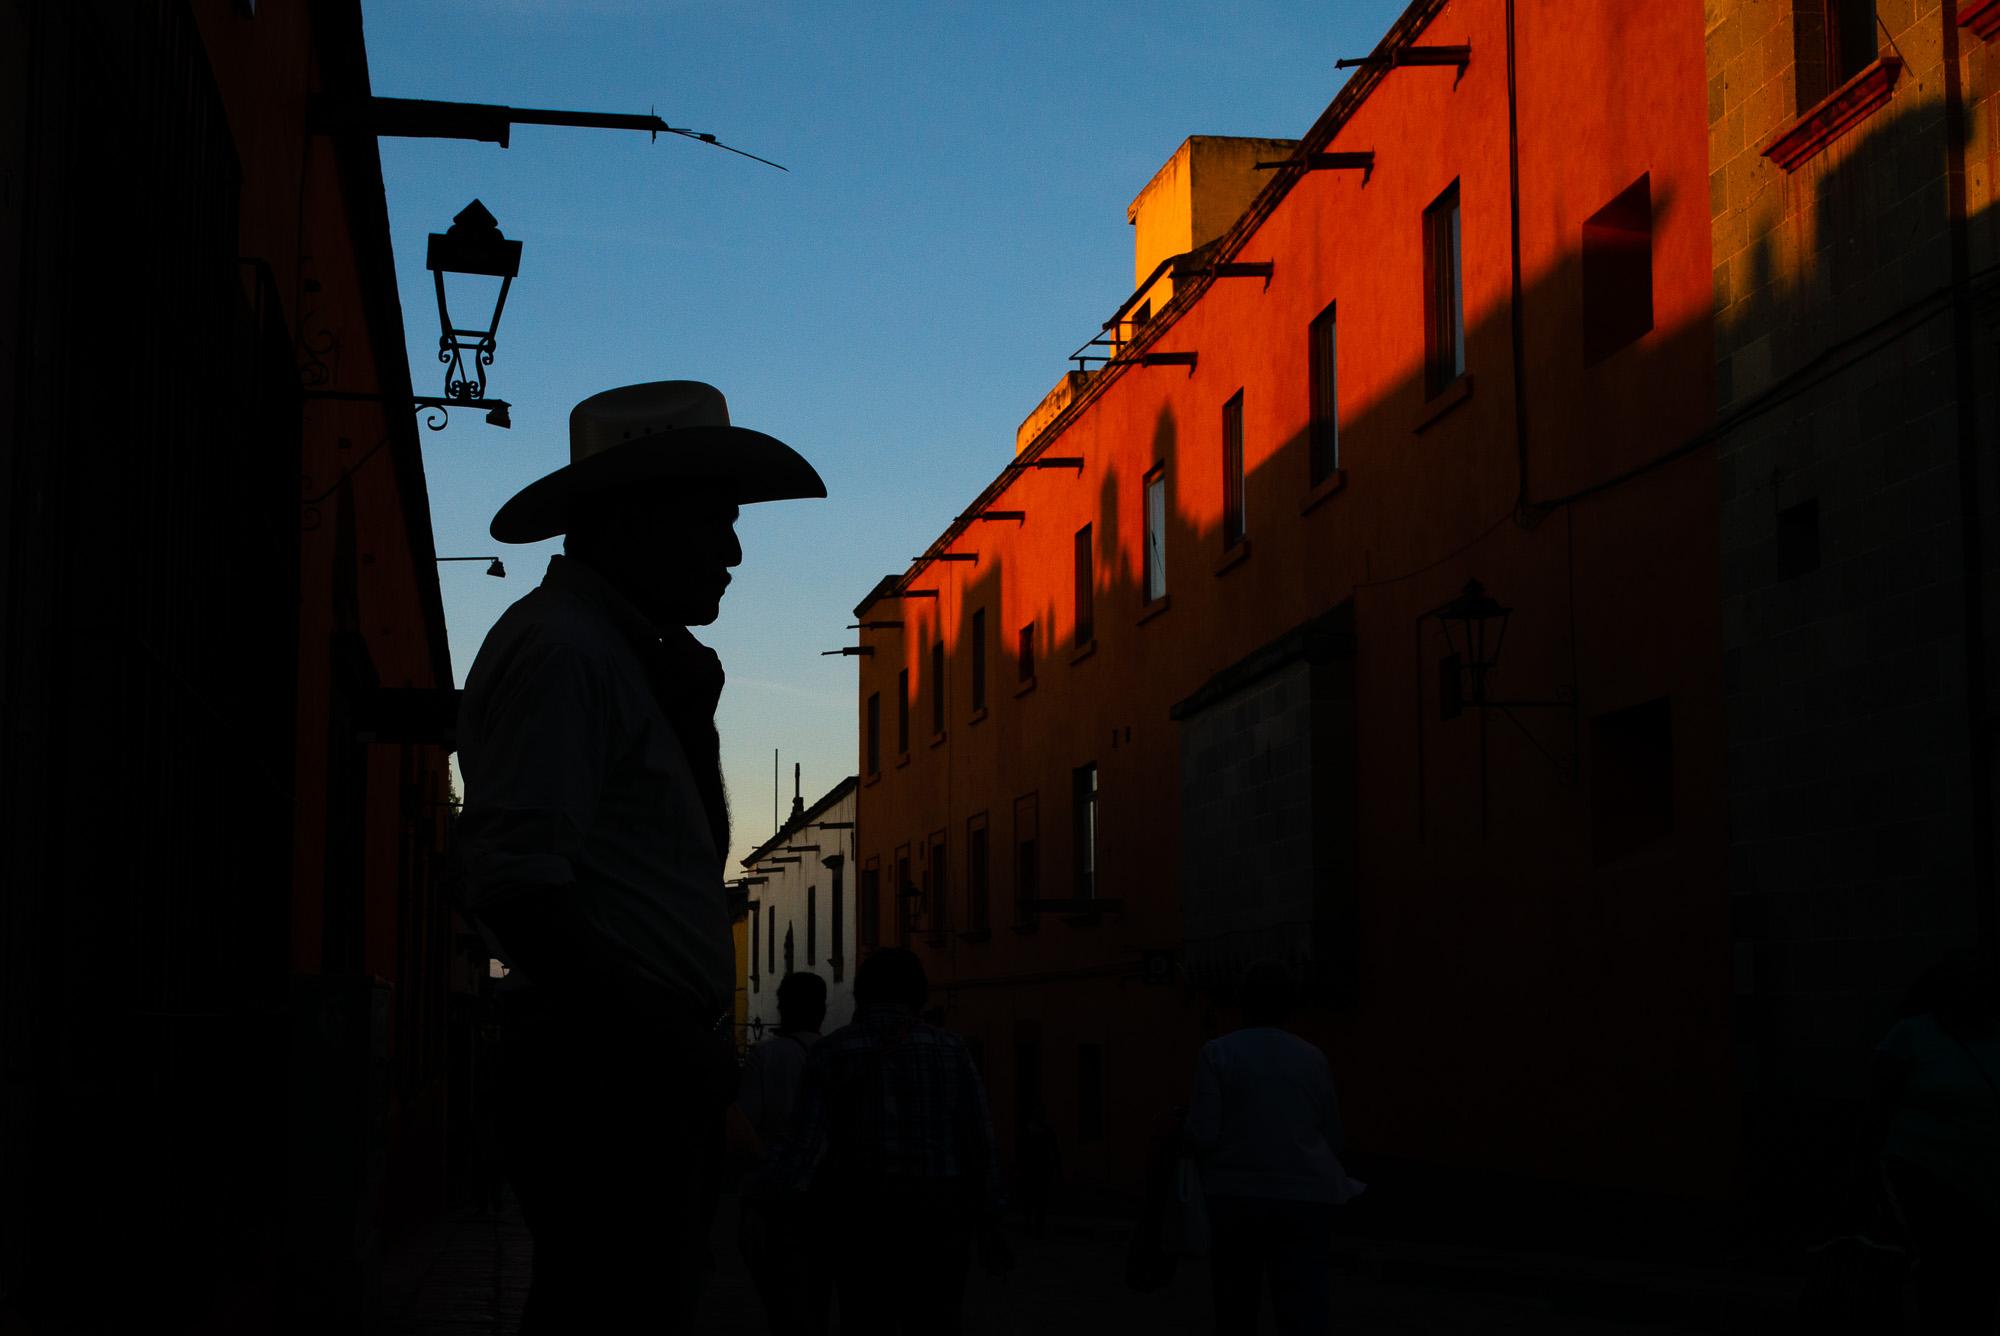 San Miguel de Allende | © 2019 Chris Suspect